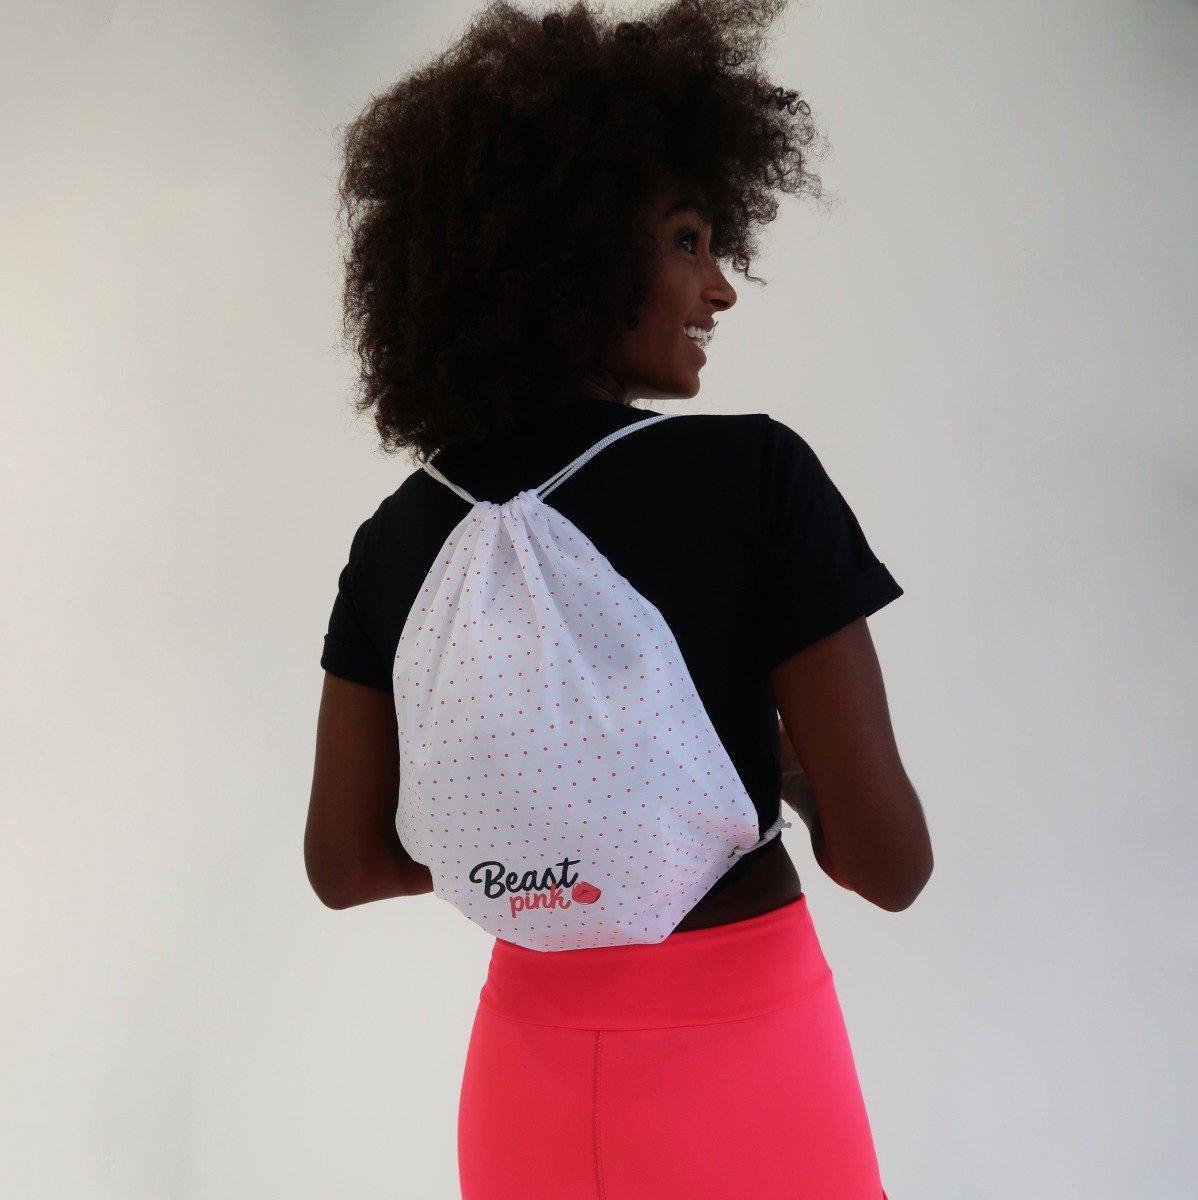 Taška String Bag White - BeastPink